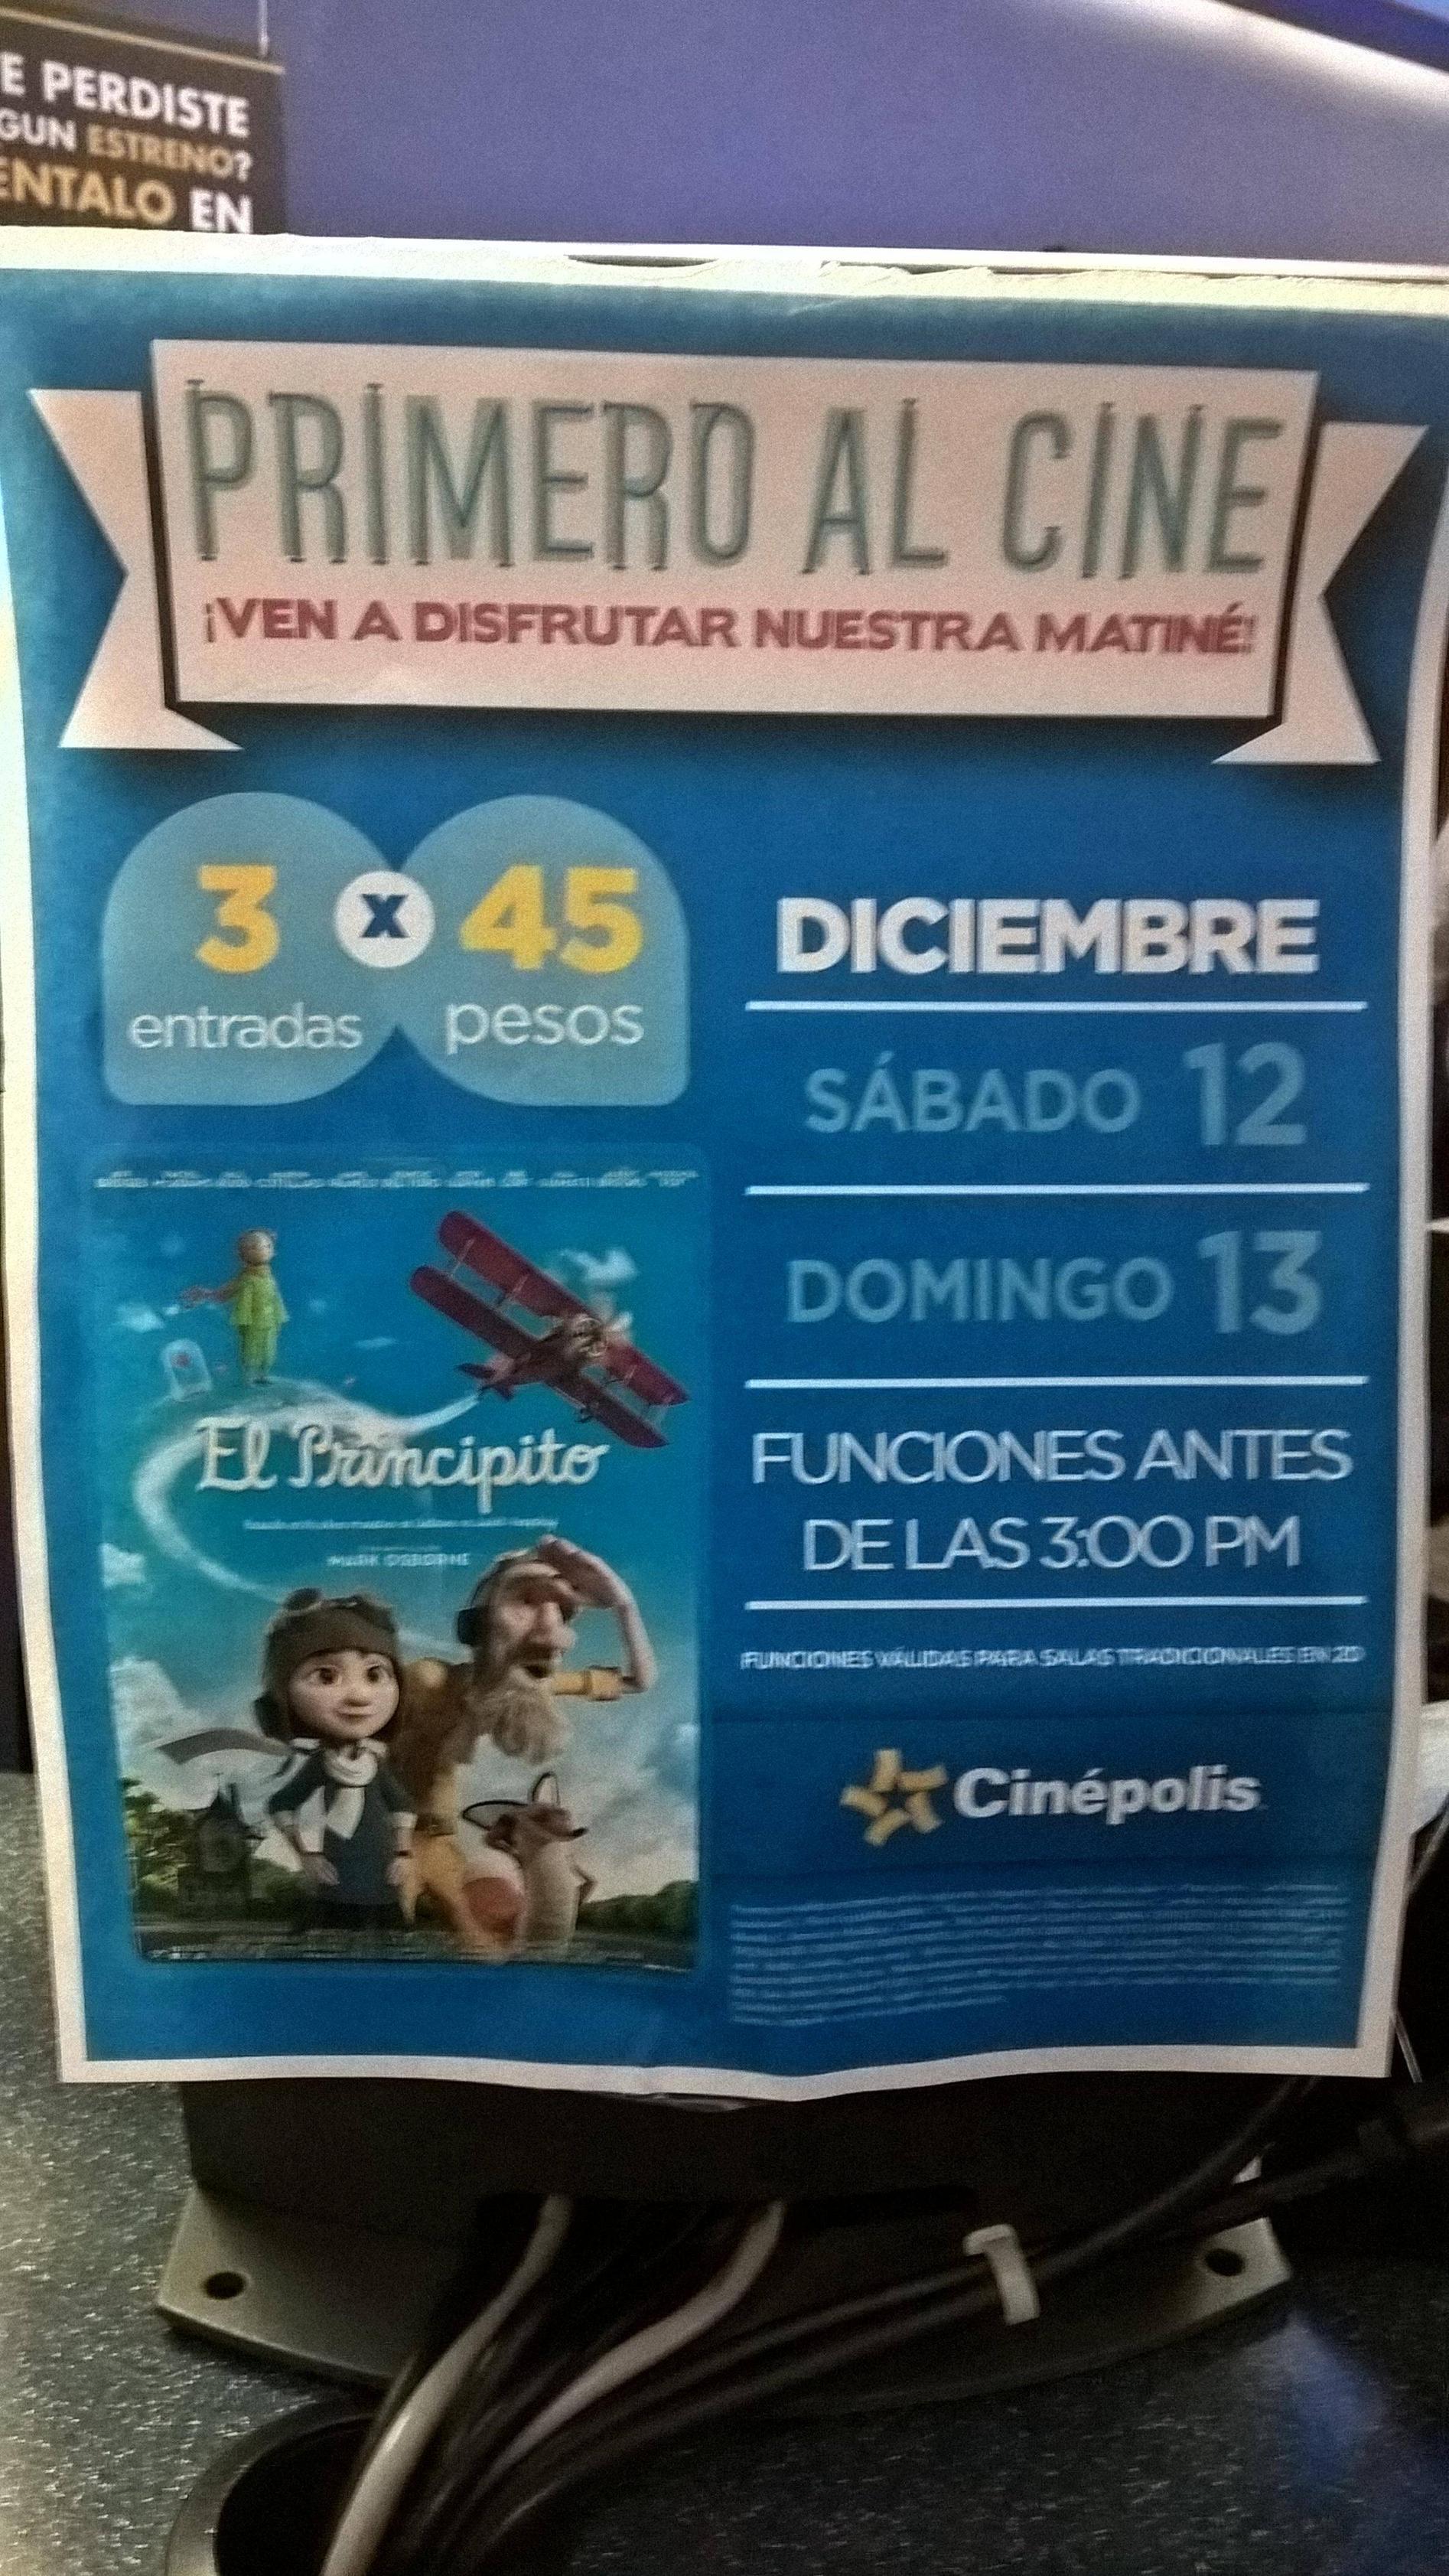 Cinépolis Matinée 12 y 13 de diciembre - El principito - 3x$45